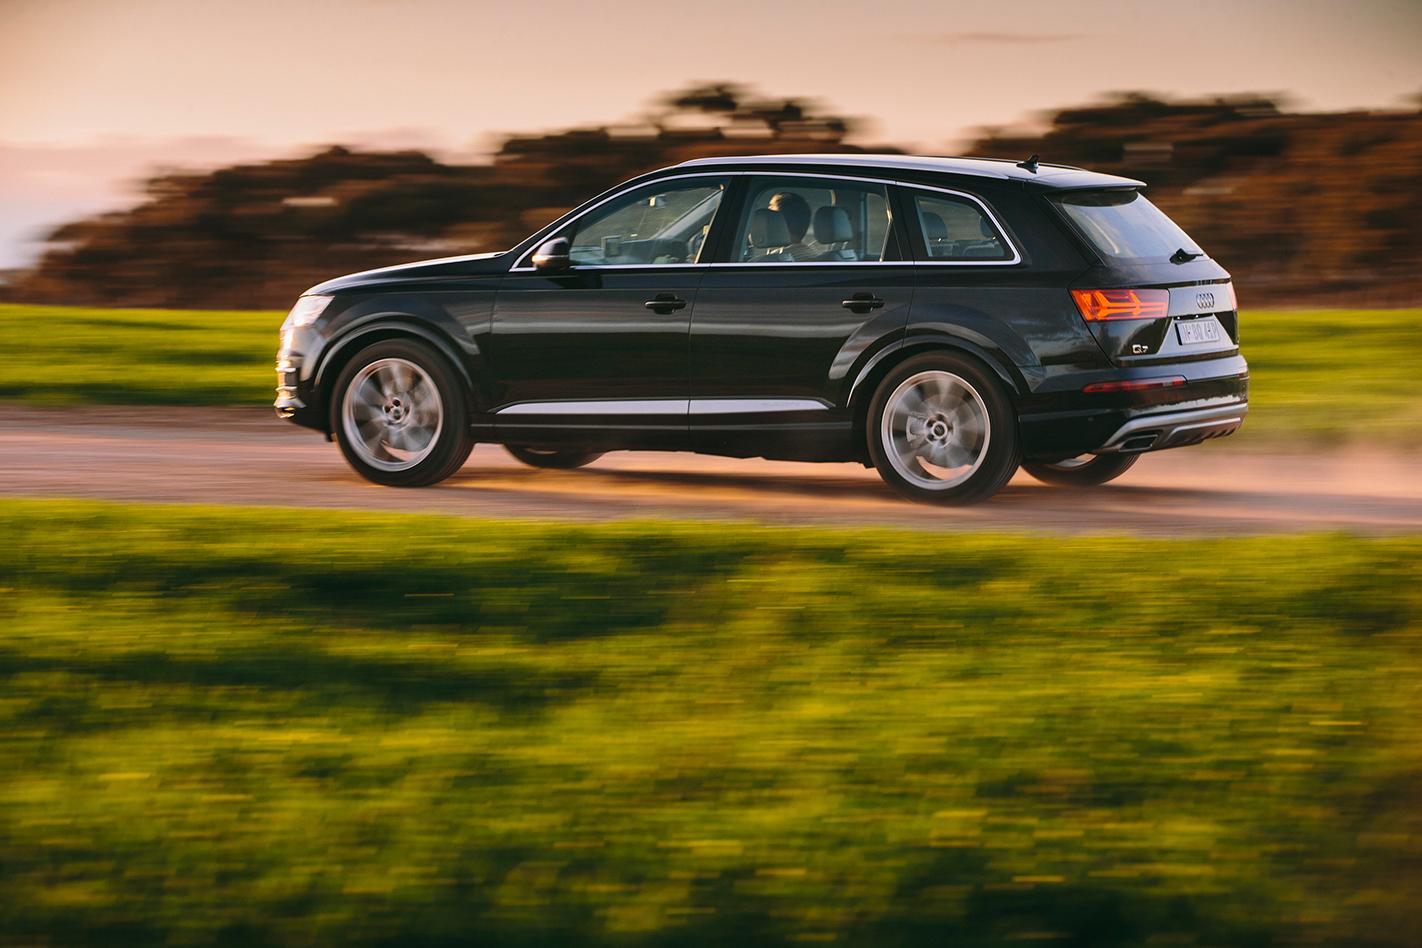 2015 Audi Q7 review